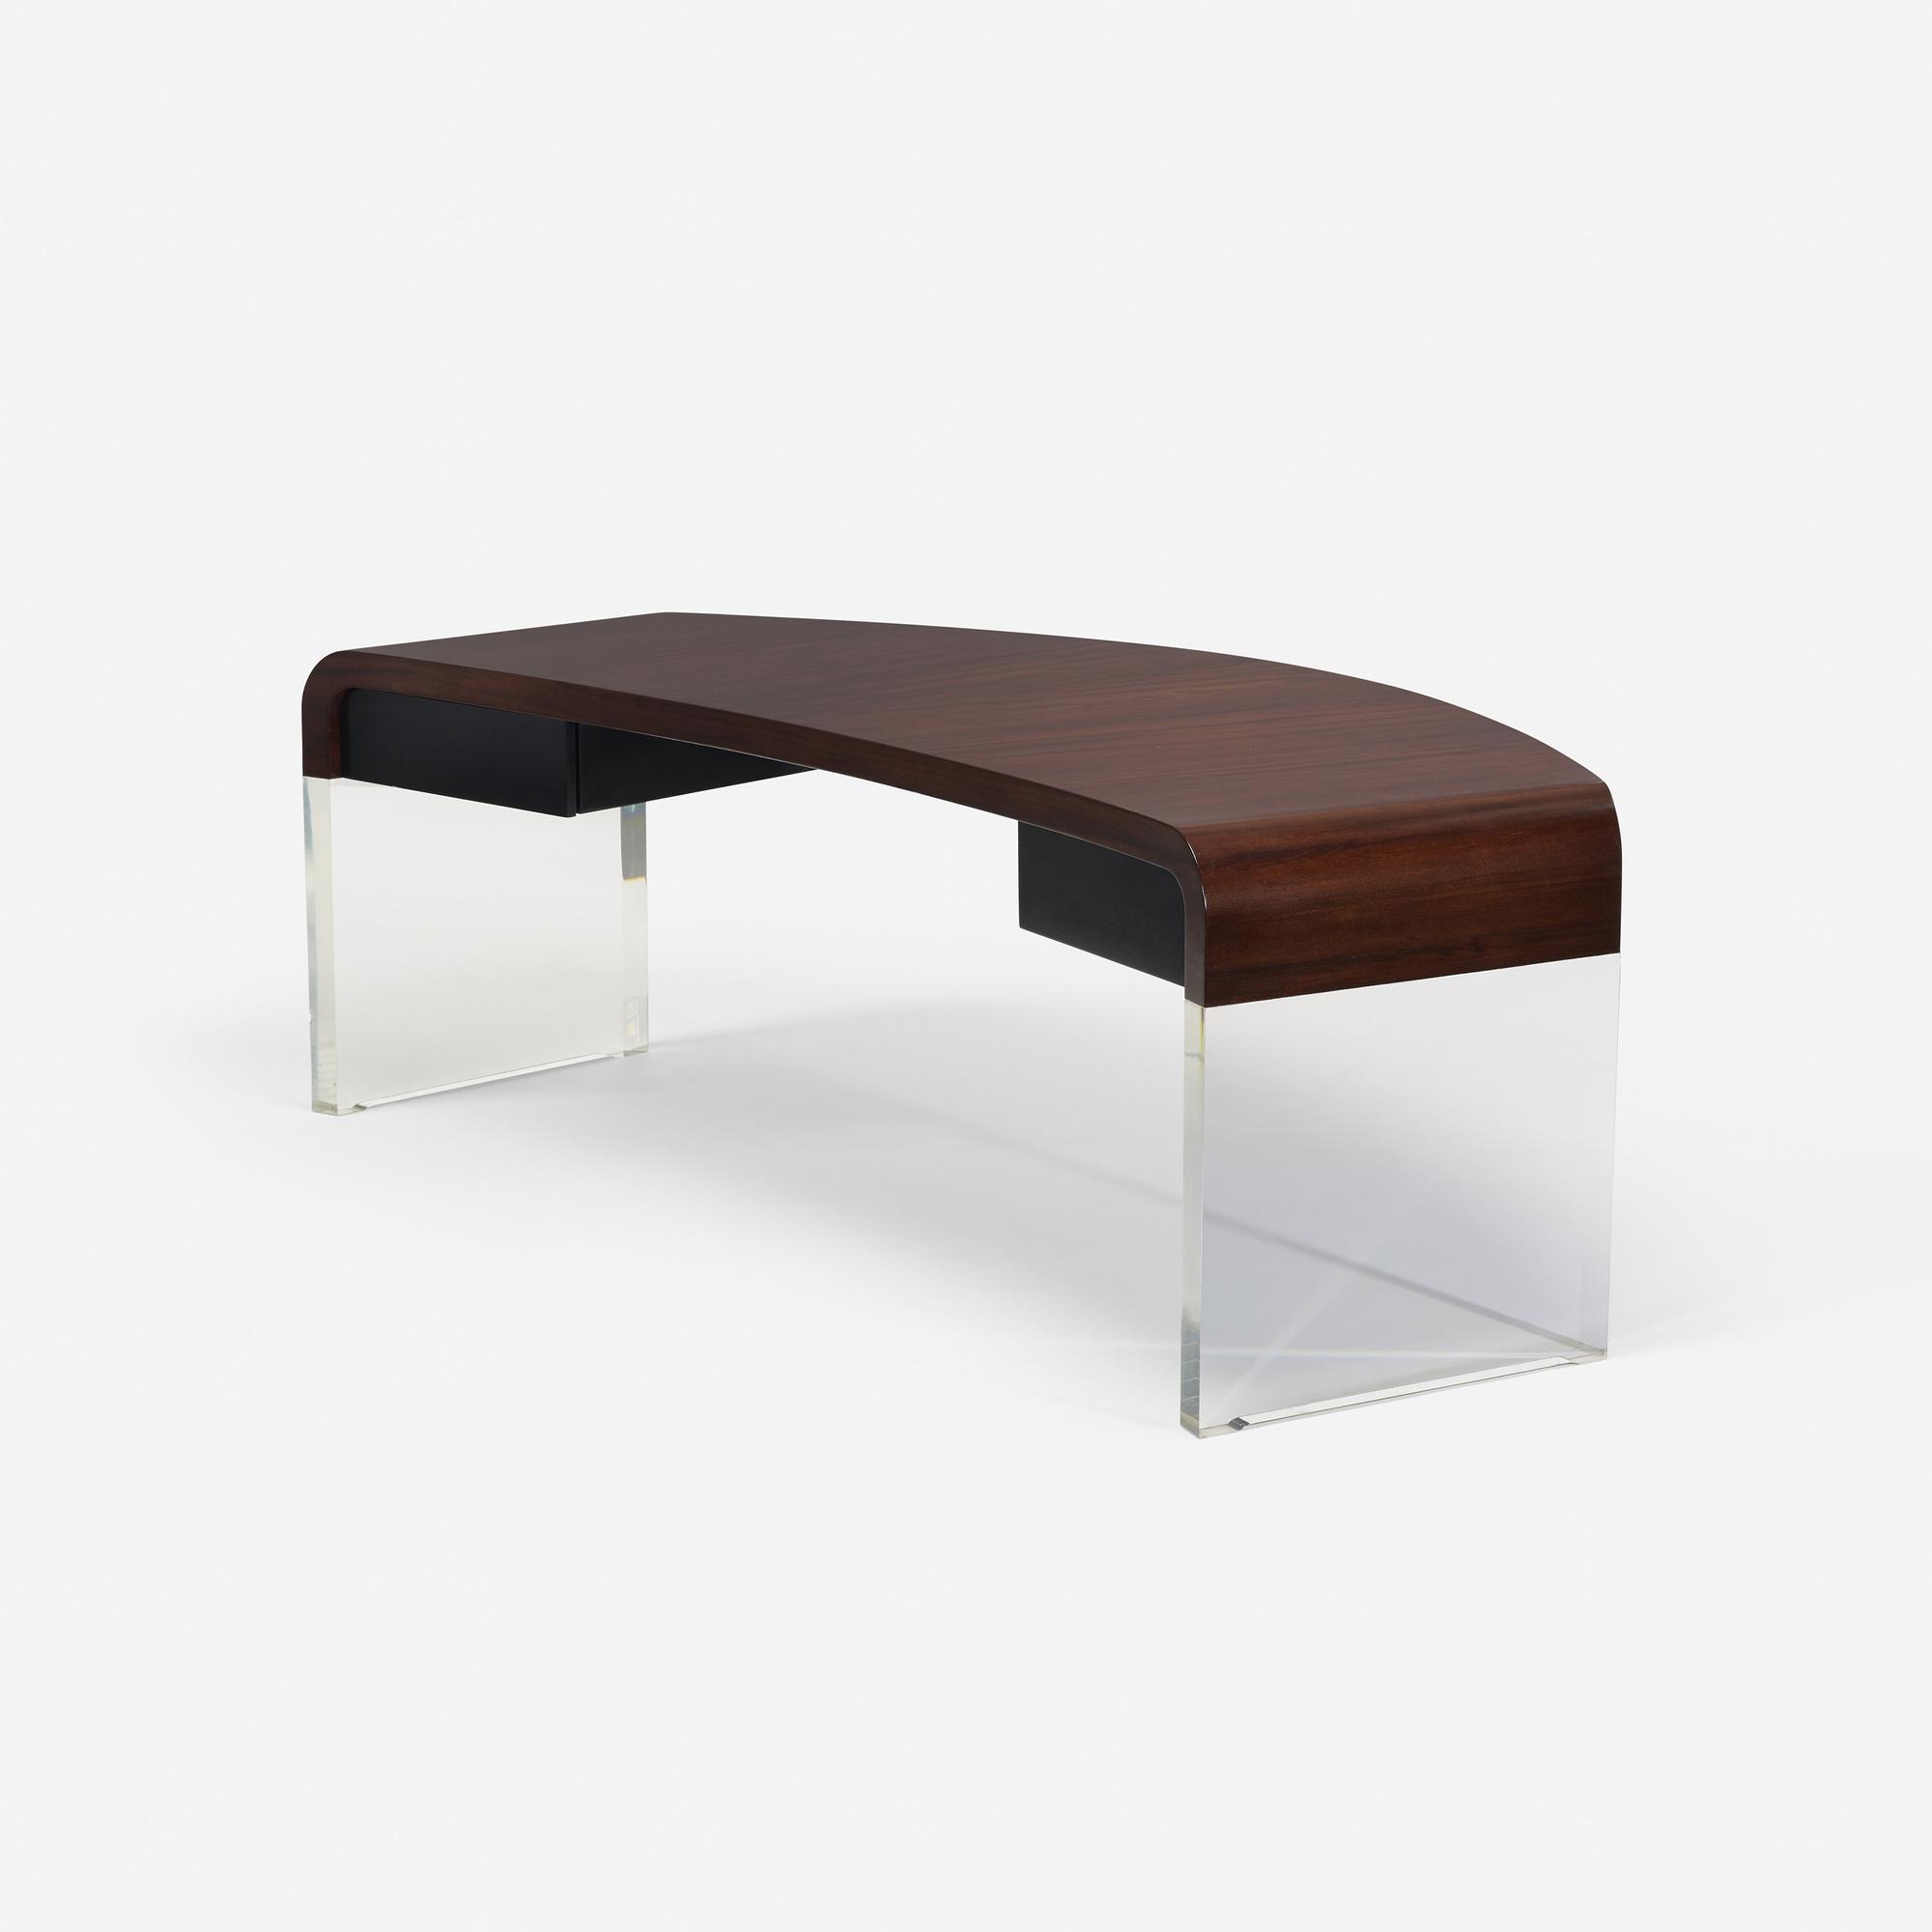 409 Vladimir Kagan desk Design 22 October 2015 Auctions